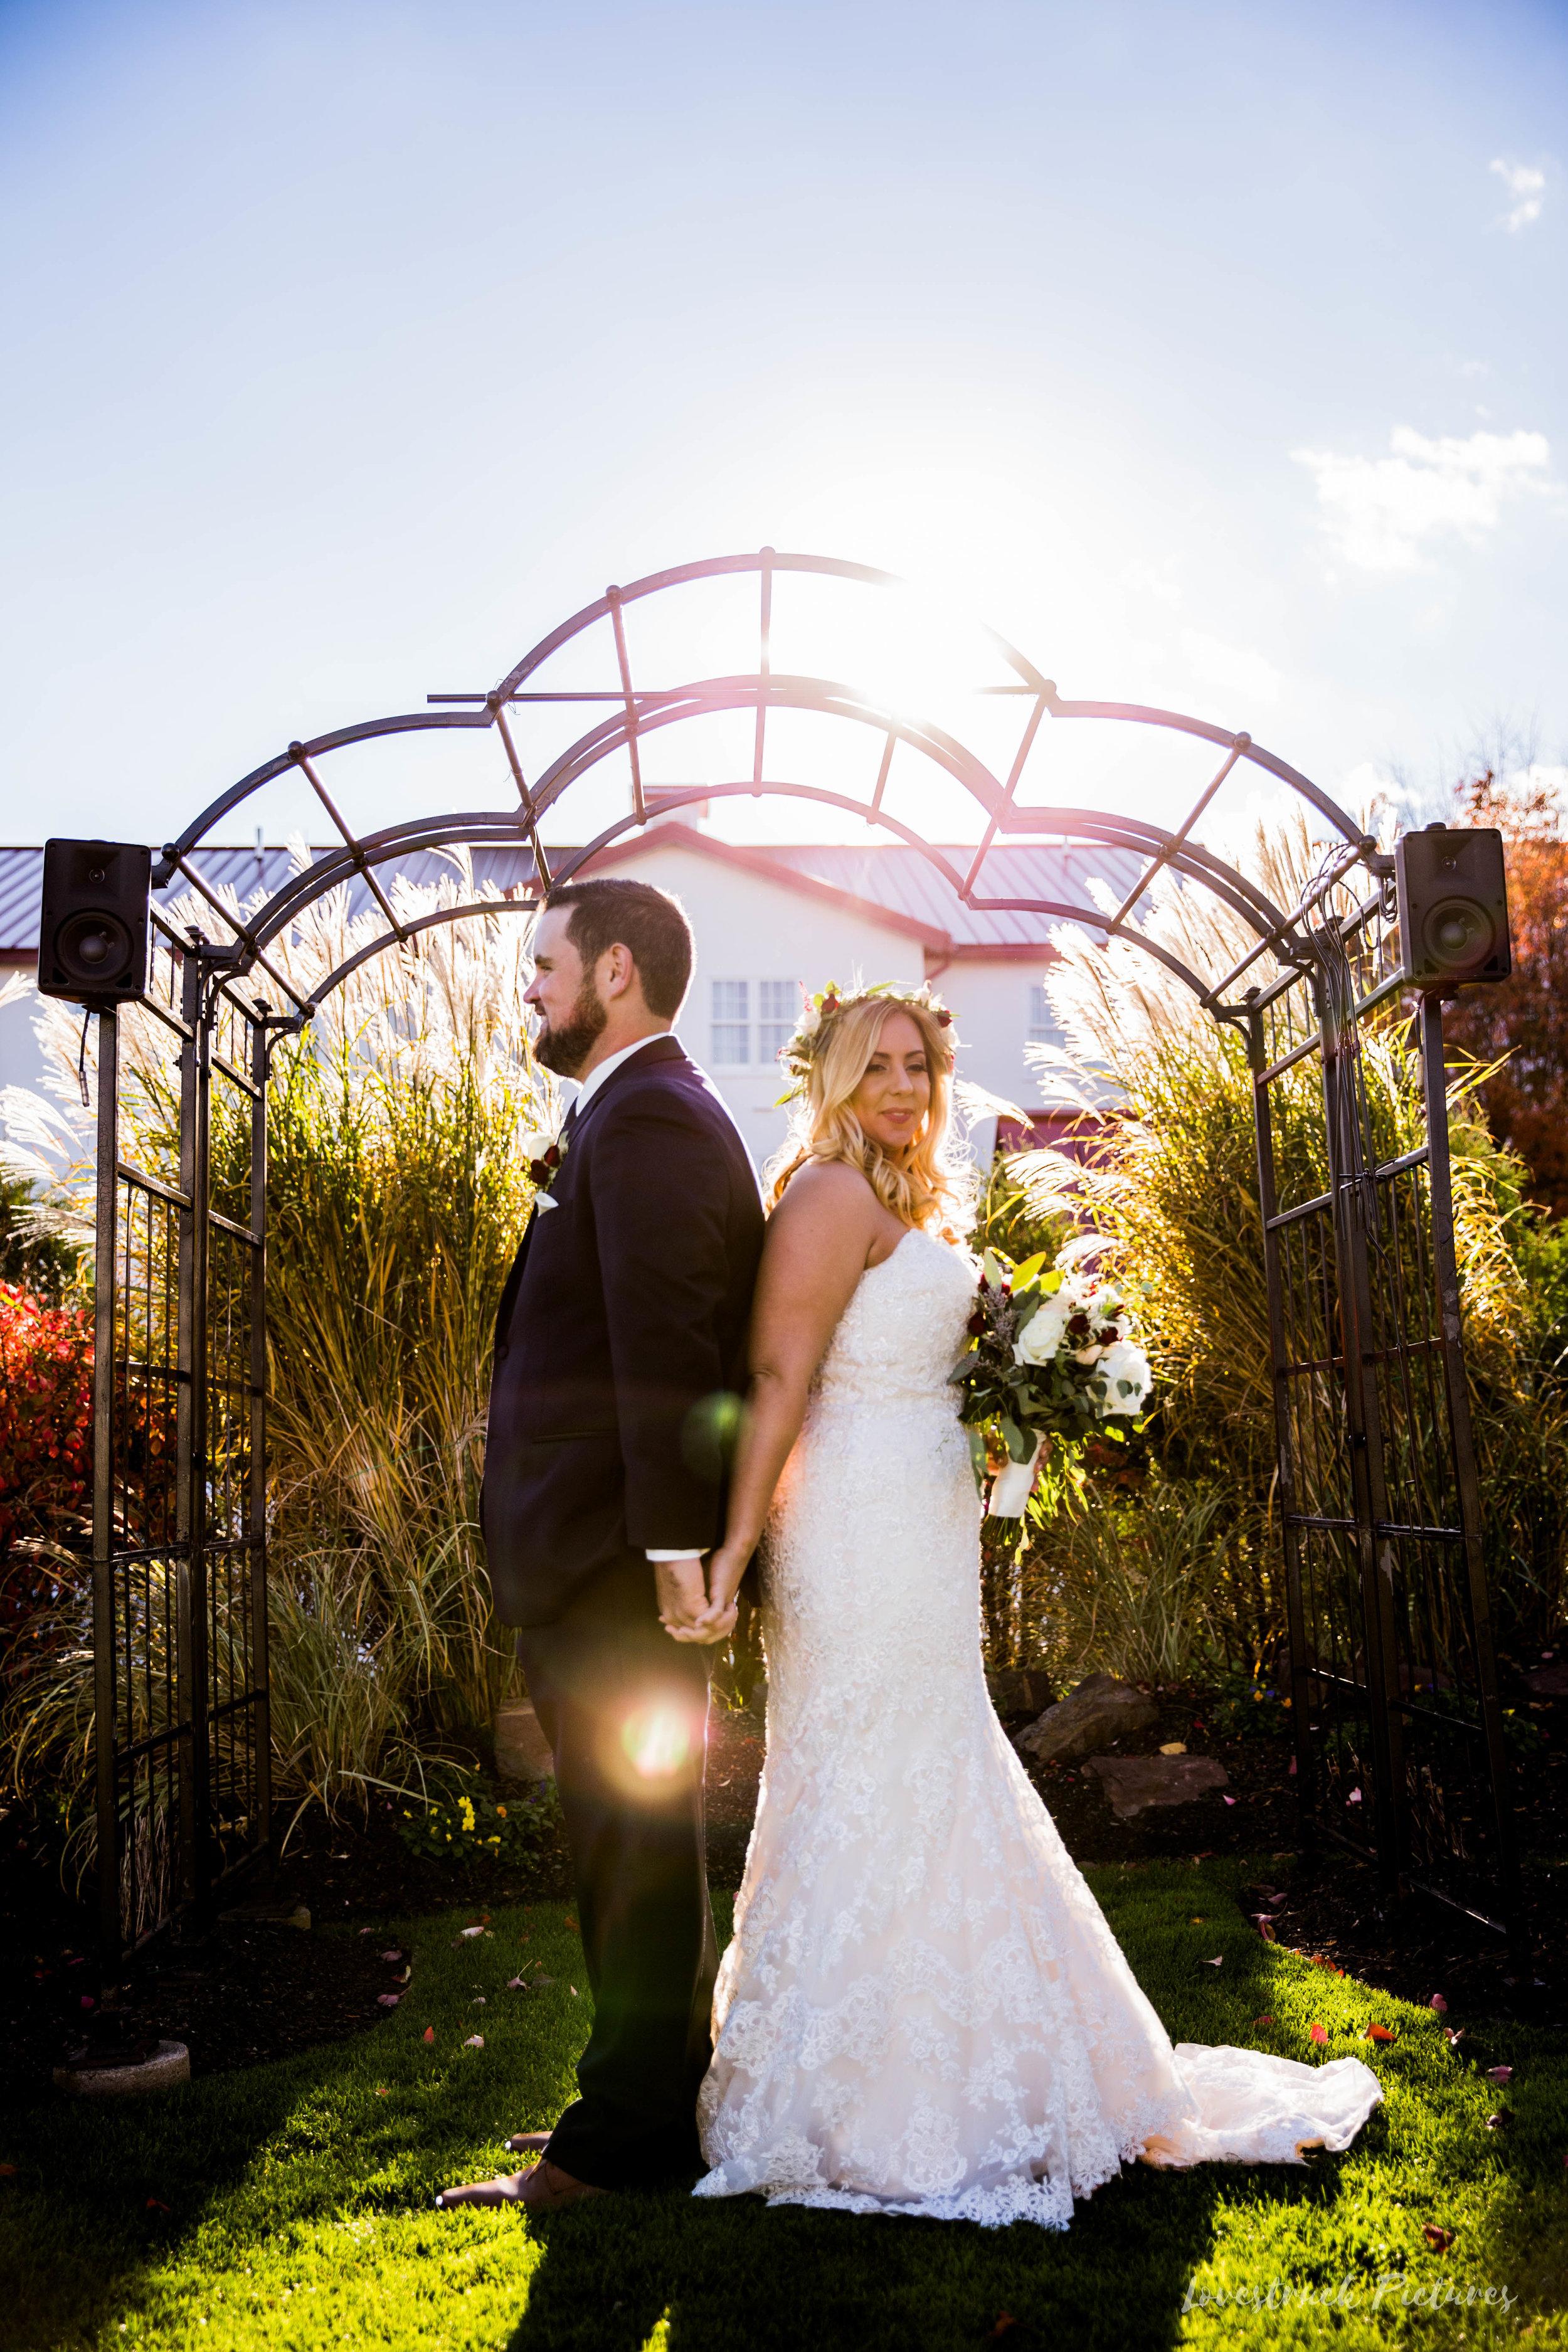 NORMANDY_FARMS_WEDDING_BLUEBELL_PA--23.jpg